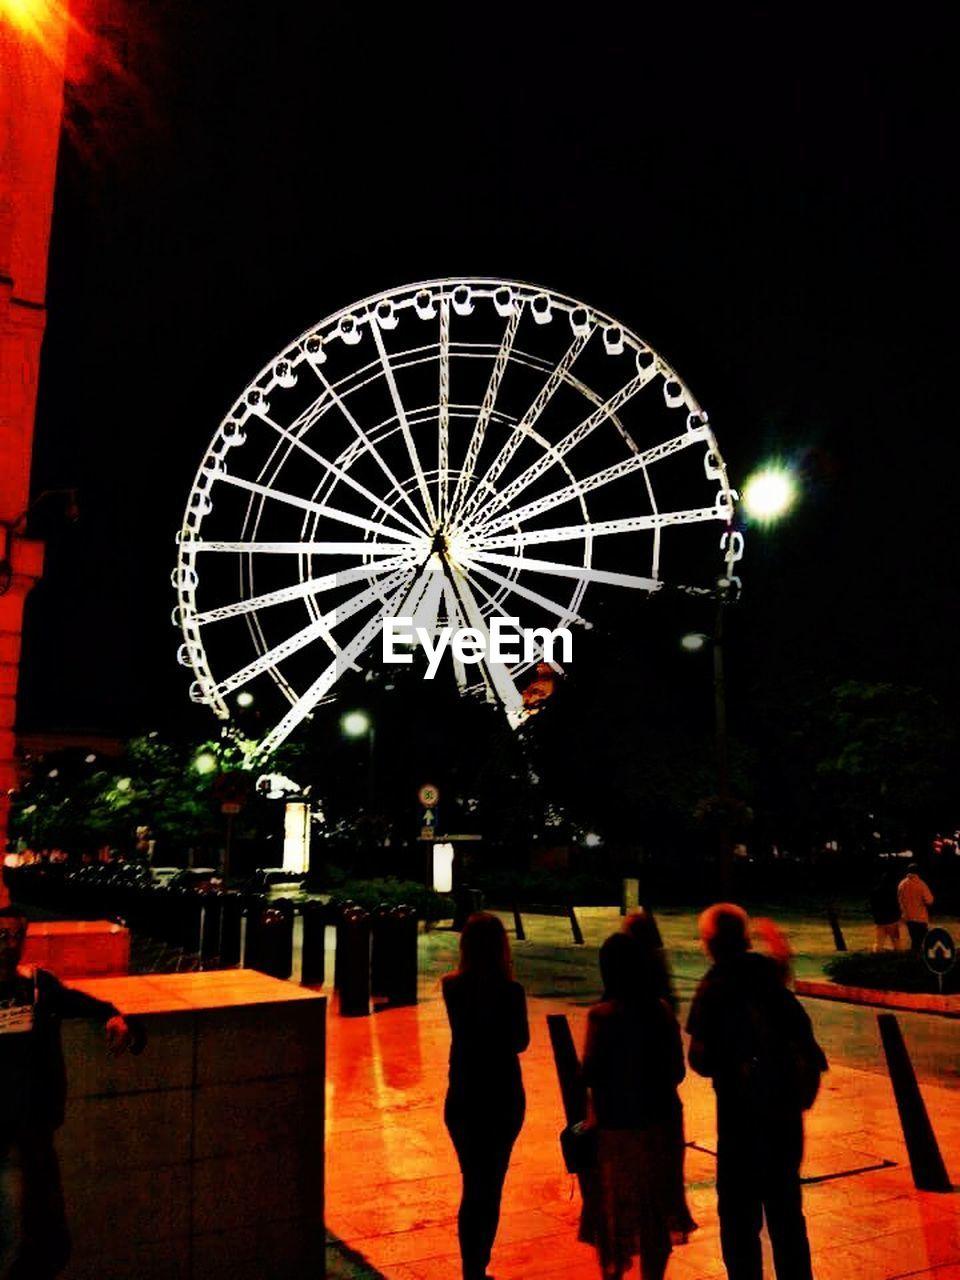 night, illuminated, leisure activity, arts culture and entertainment, amusement park, ferris wheel, real people, lifestyles, women, outdoors, sky